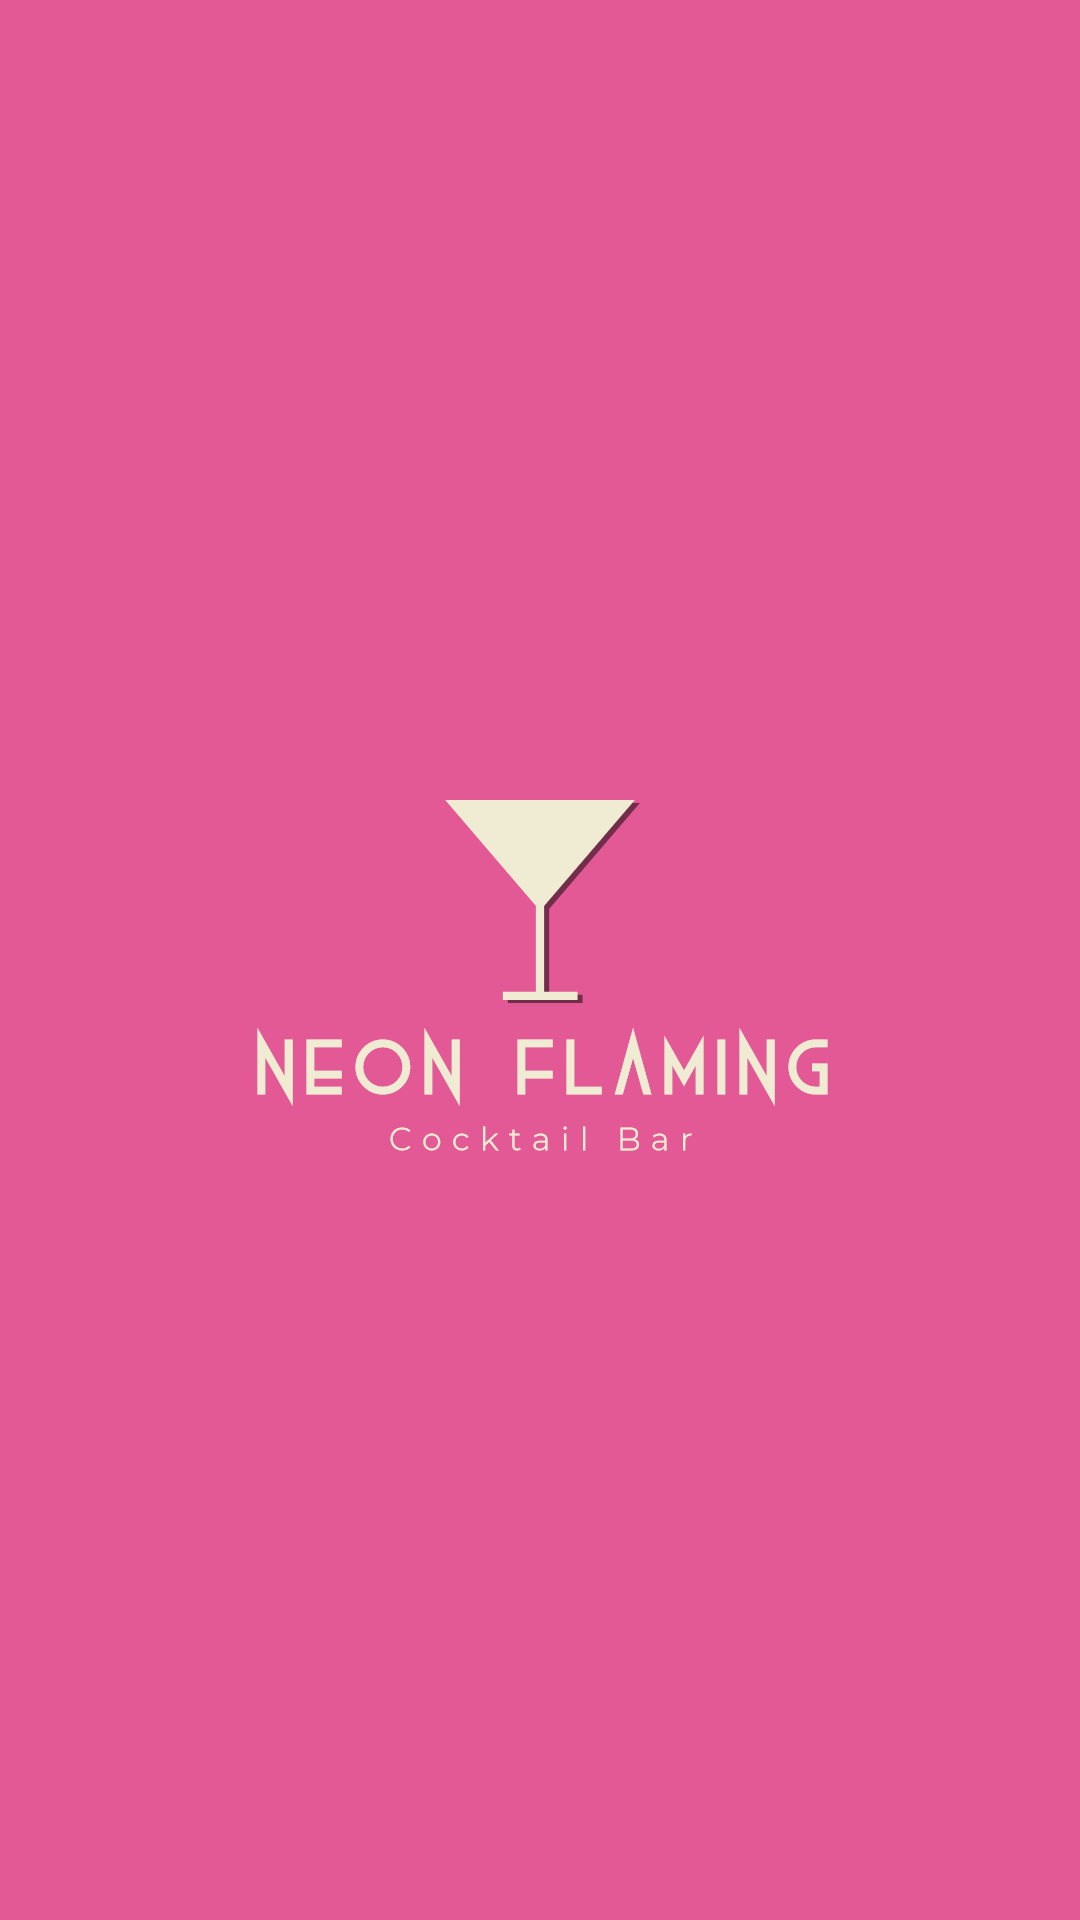 Editable Cocktail Bar Logo Easy to Animation  Template